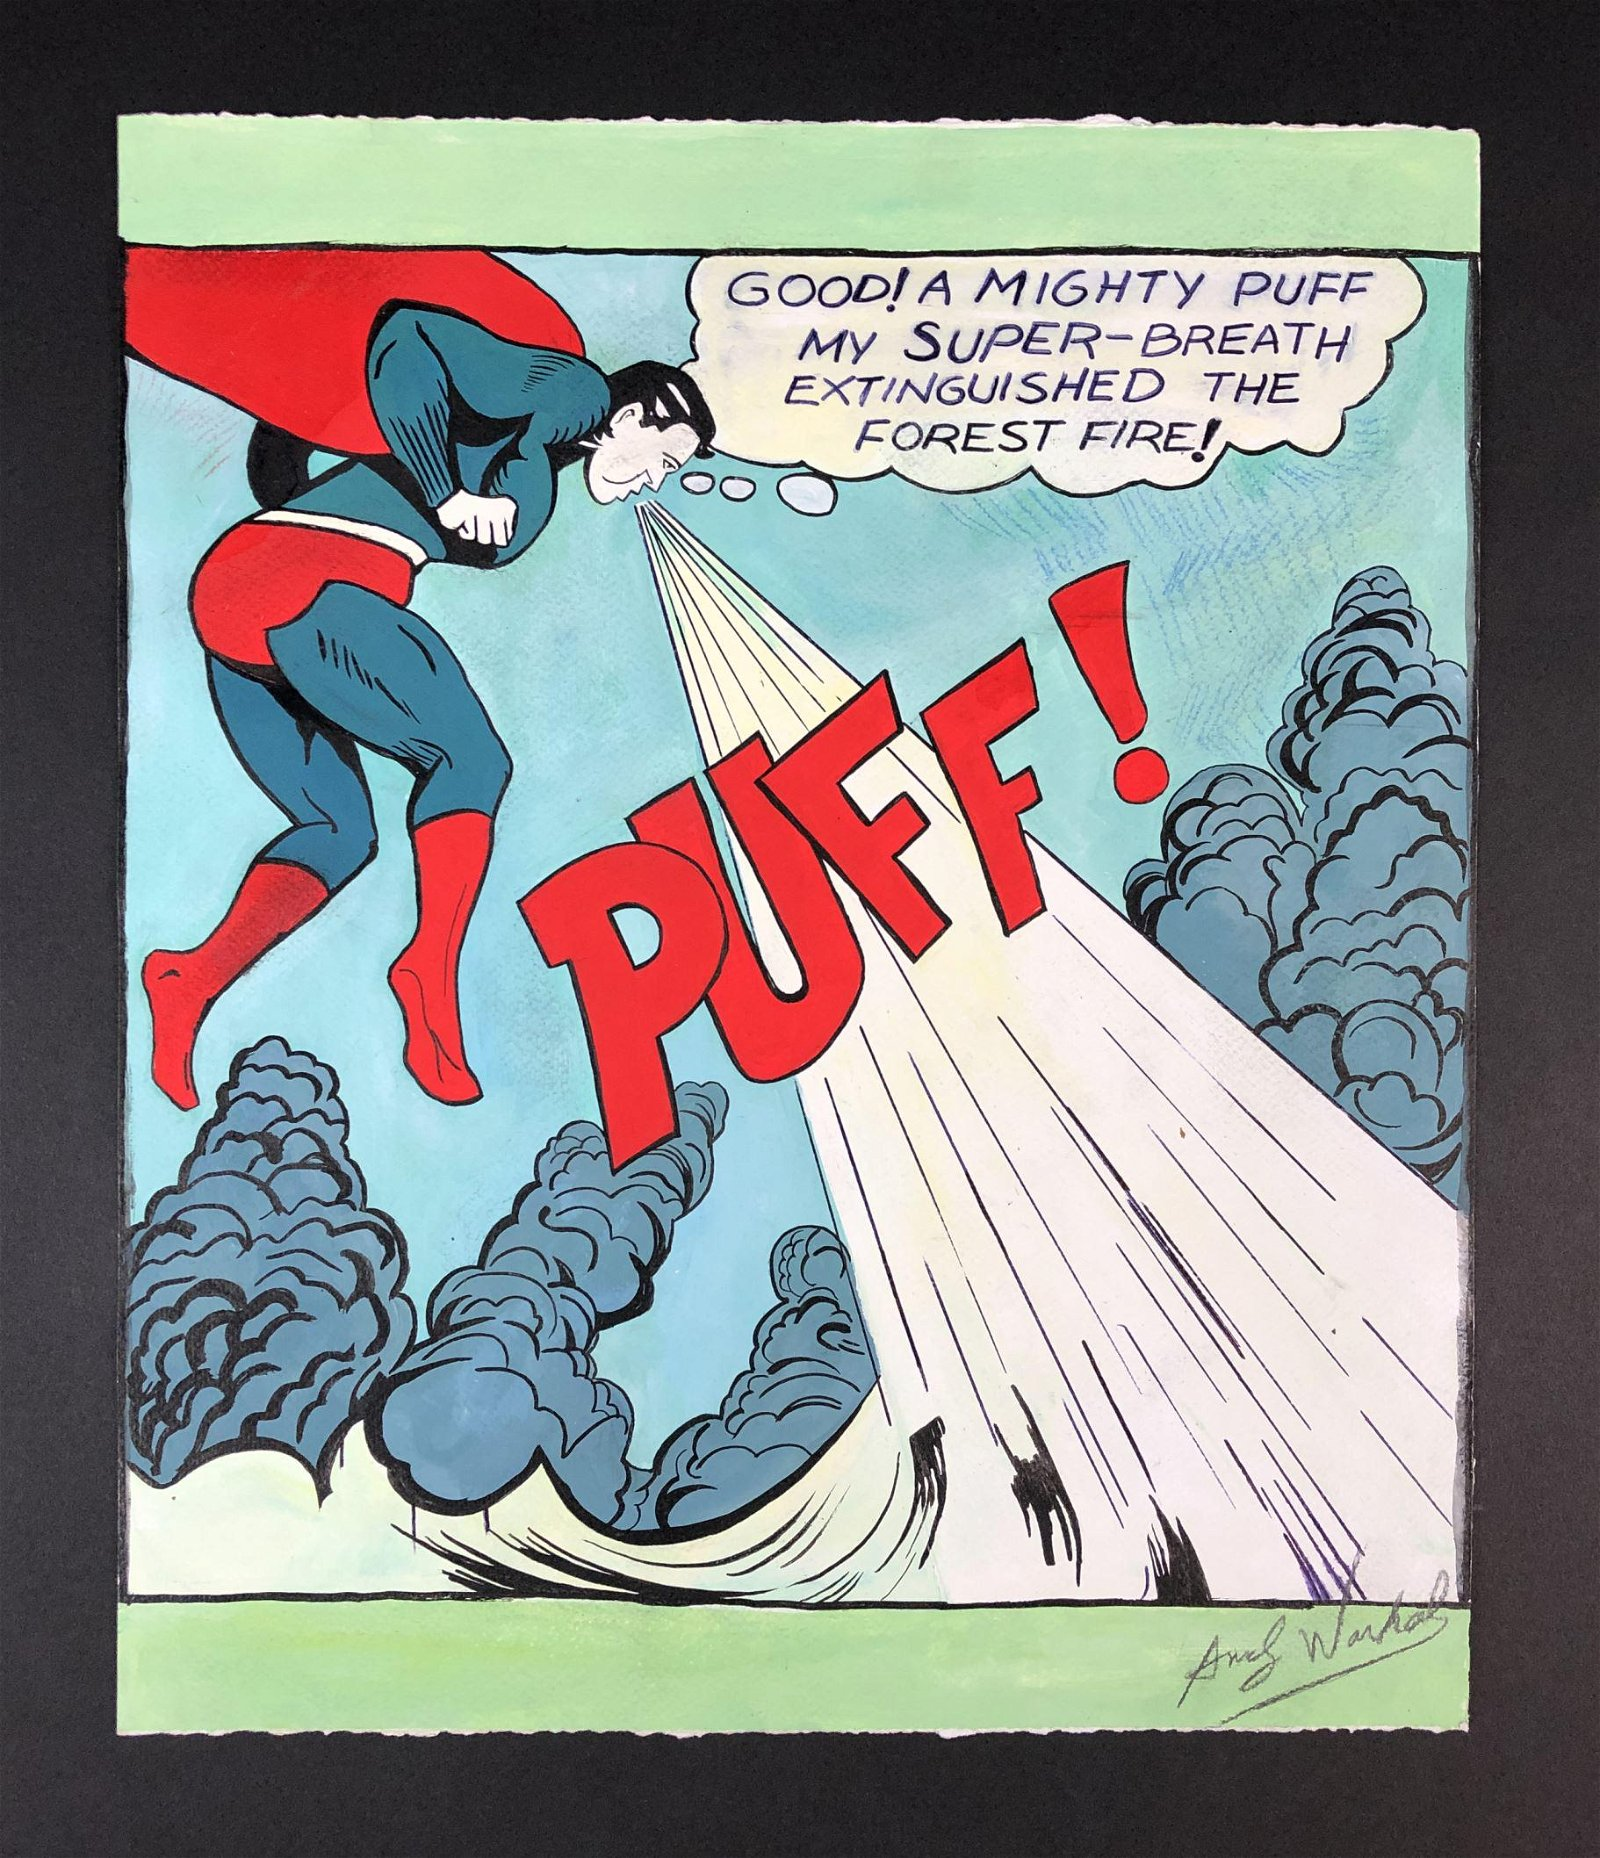 Andy Warhol (1928 - 1987) - Mixed Media Illustration on